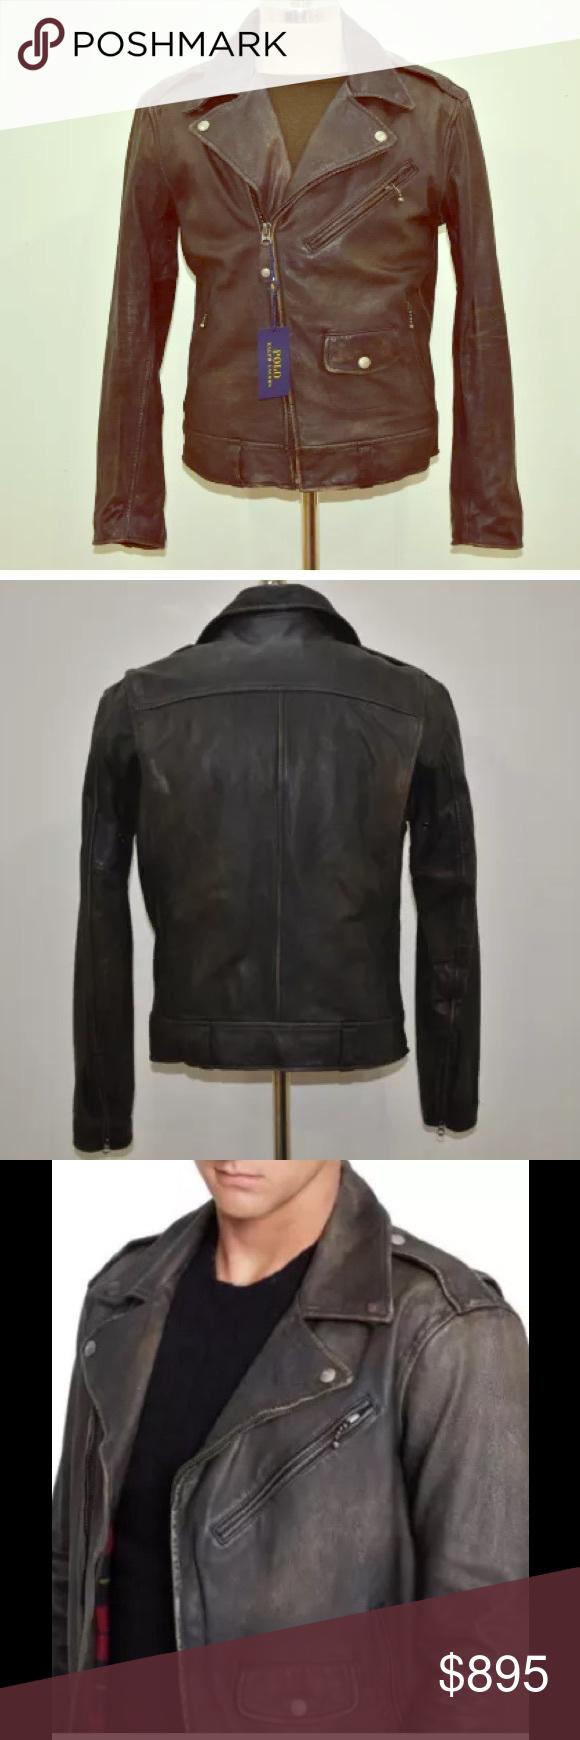 Men's Polo Ralph Lauren distressed leather jacket. Men's Polo Ralph Lauren brown distressed leather full-zip biker bomber jacket. (Small) with original tag. Polo Ralph Lauren Jackets & Coats Bomber & Varsity